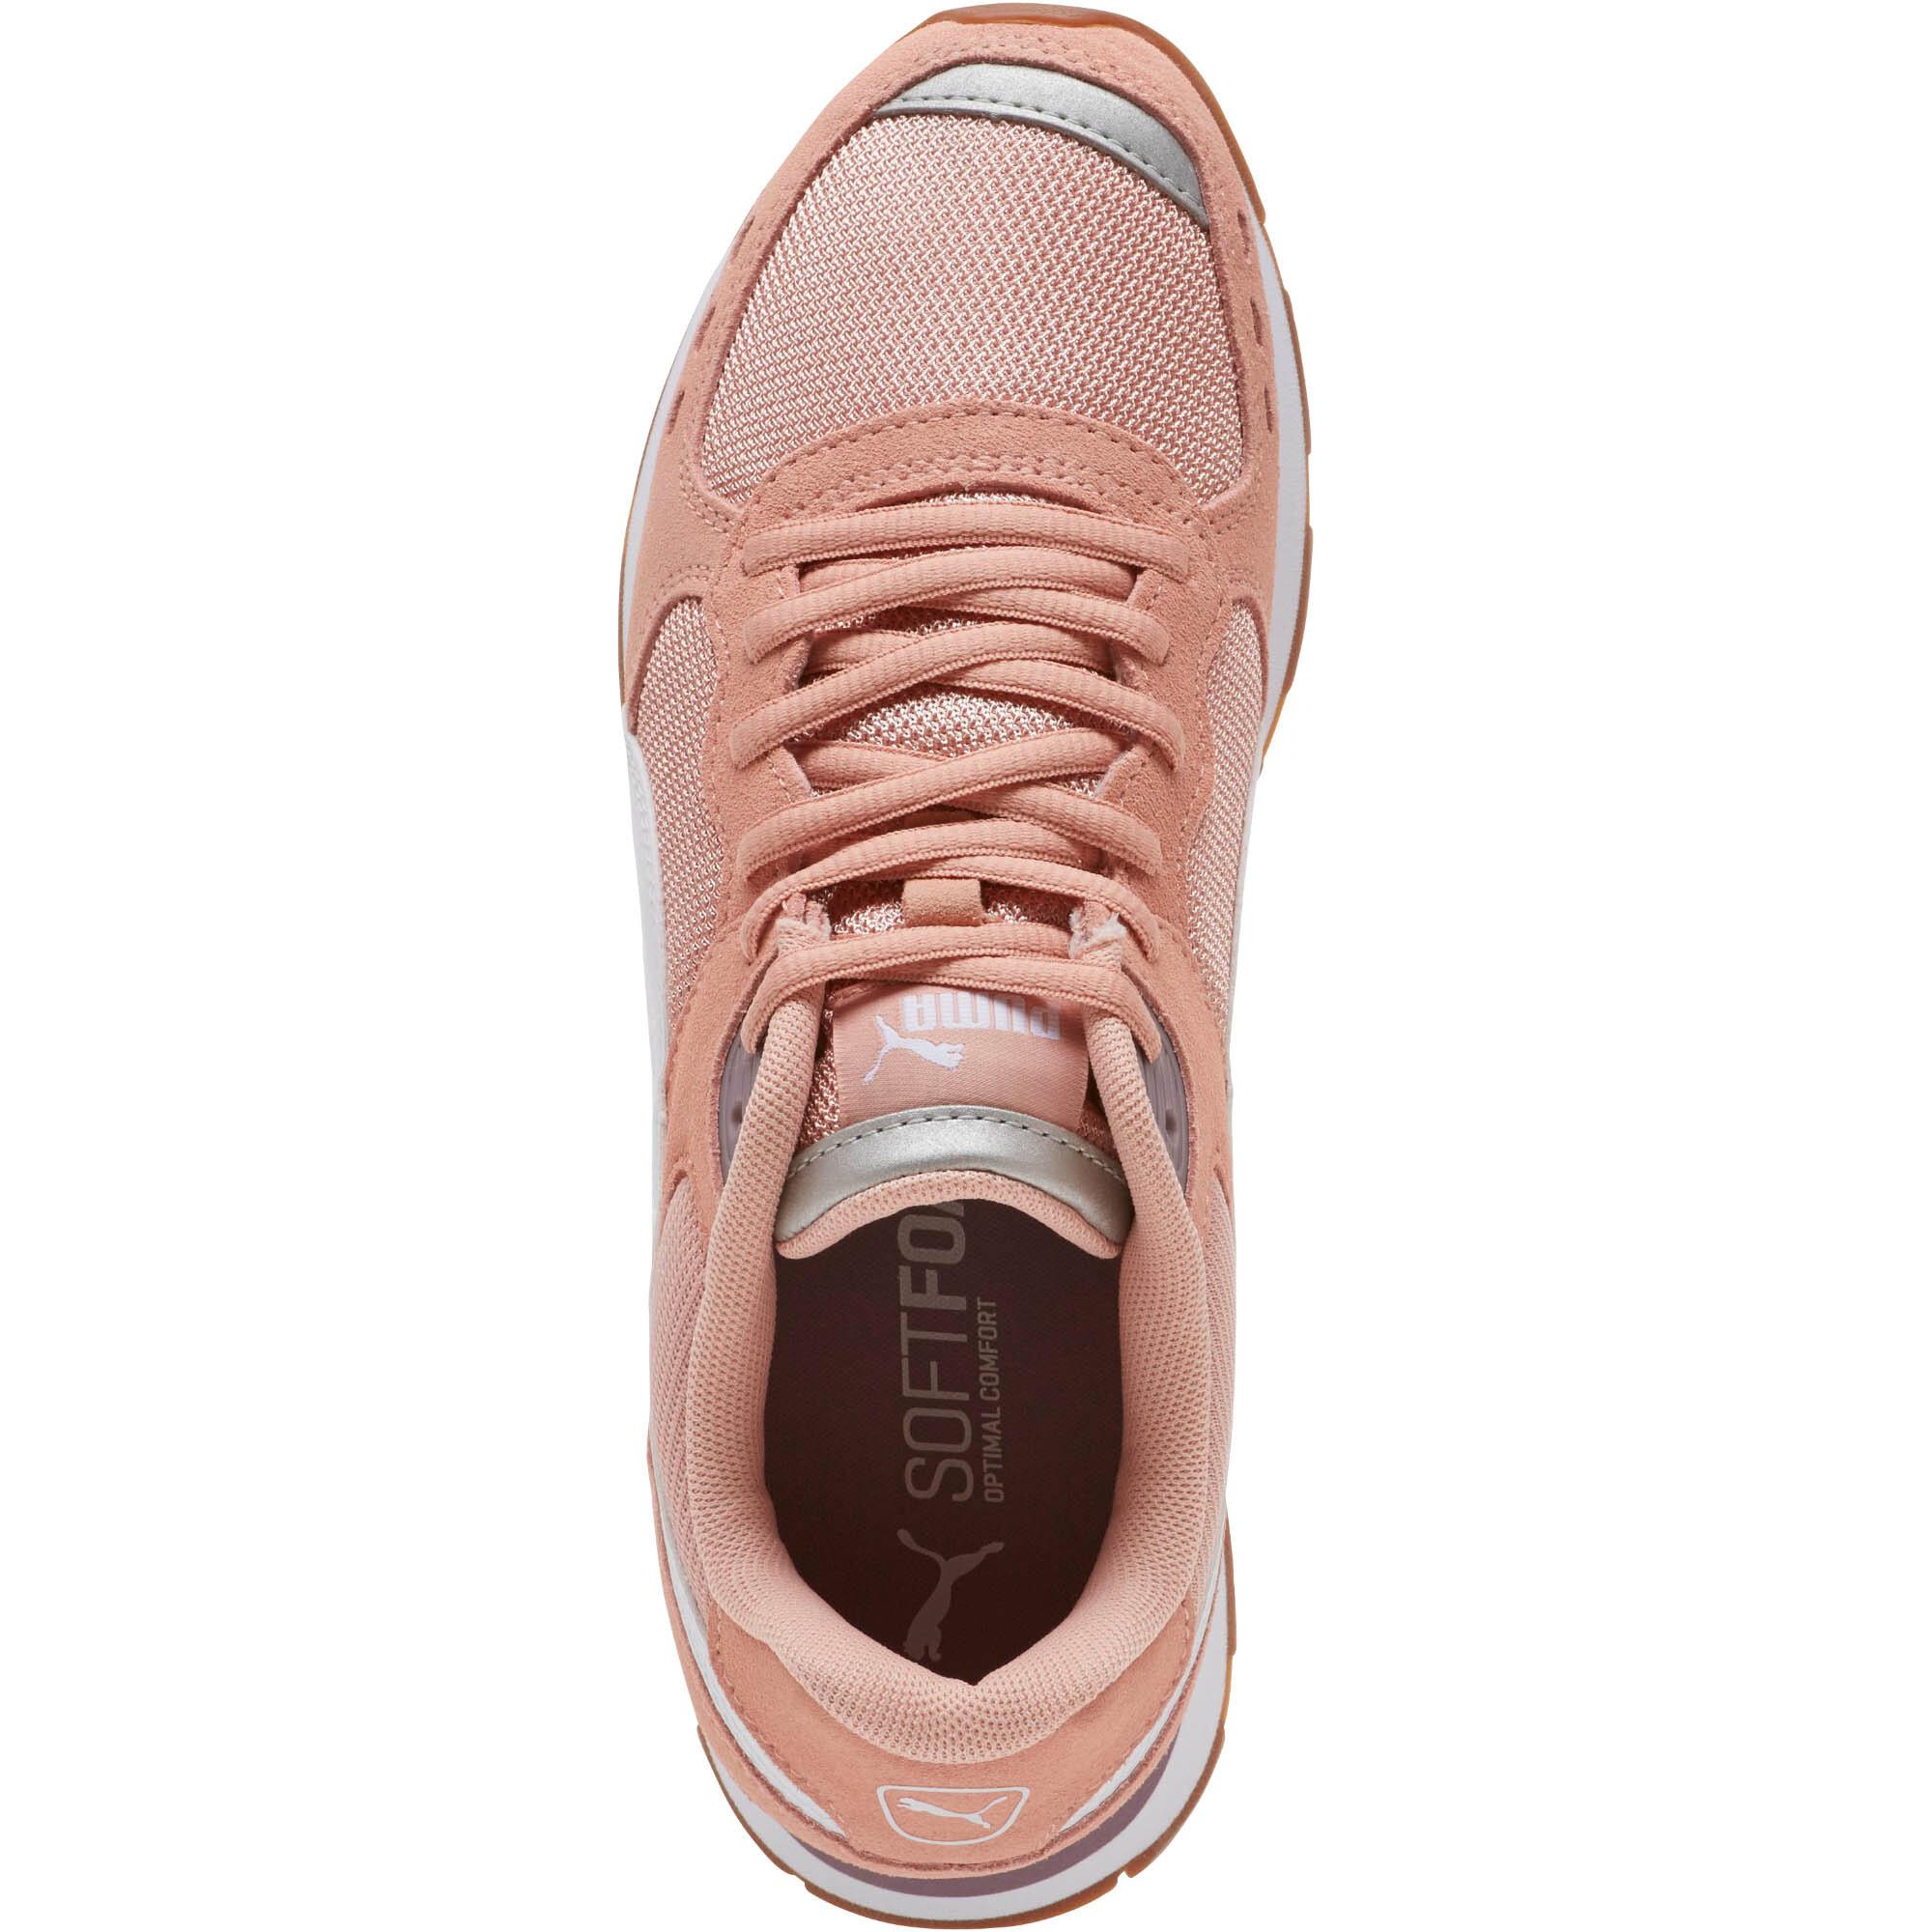 PUMA-Vista-Women-s-Sneakers-Women-Shoe-Basics thumbnail 16